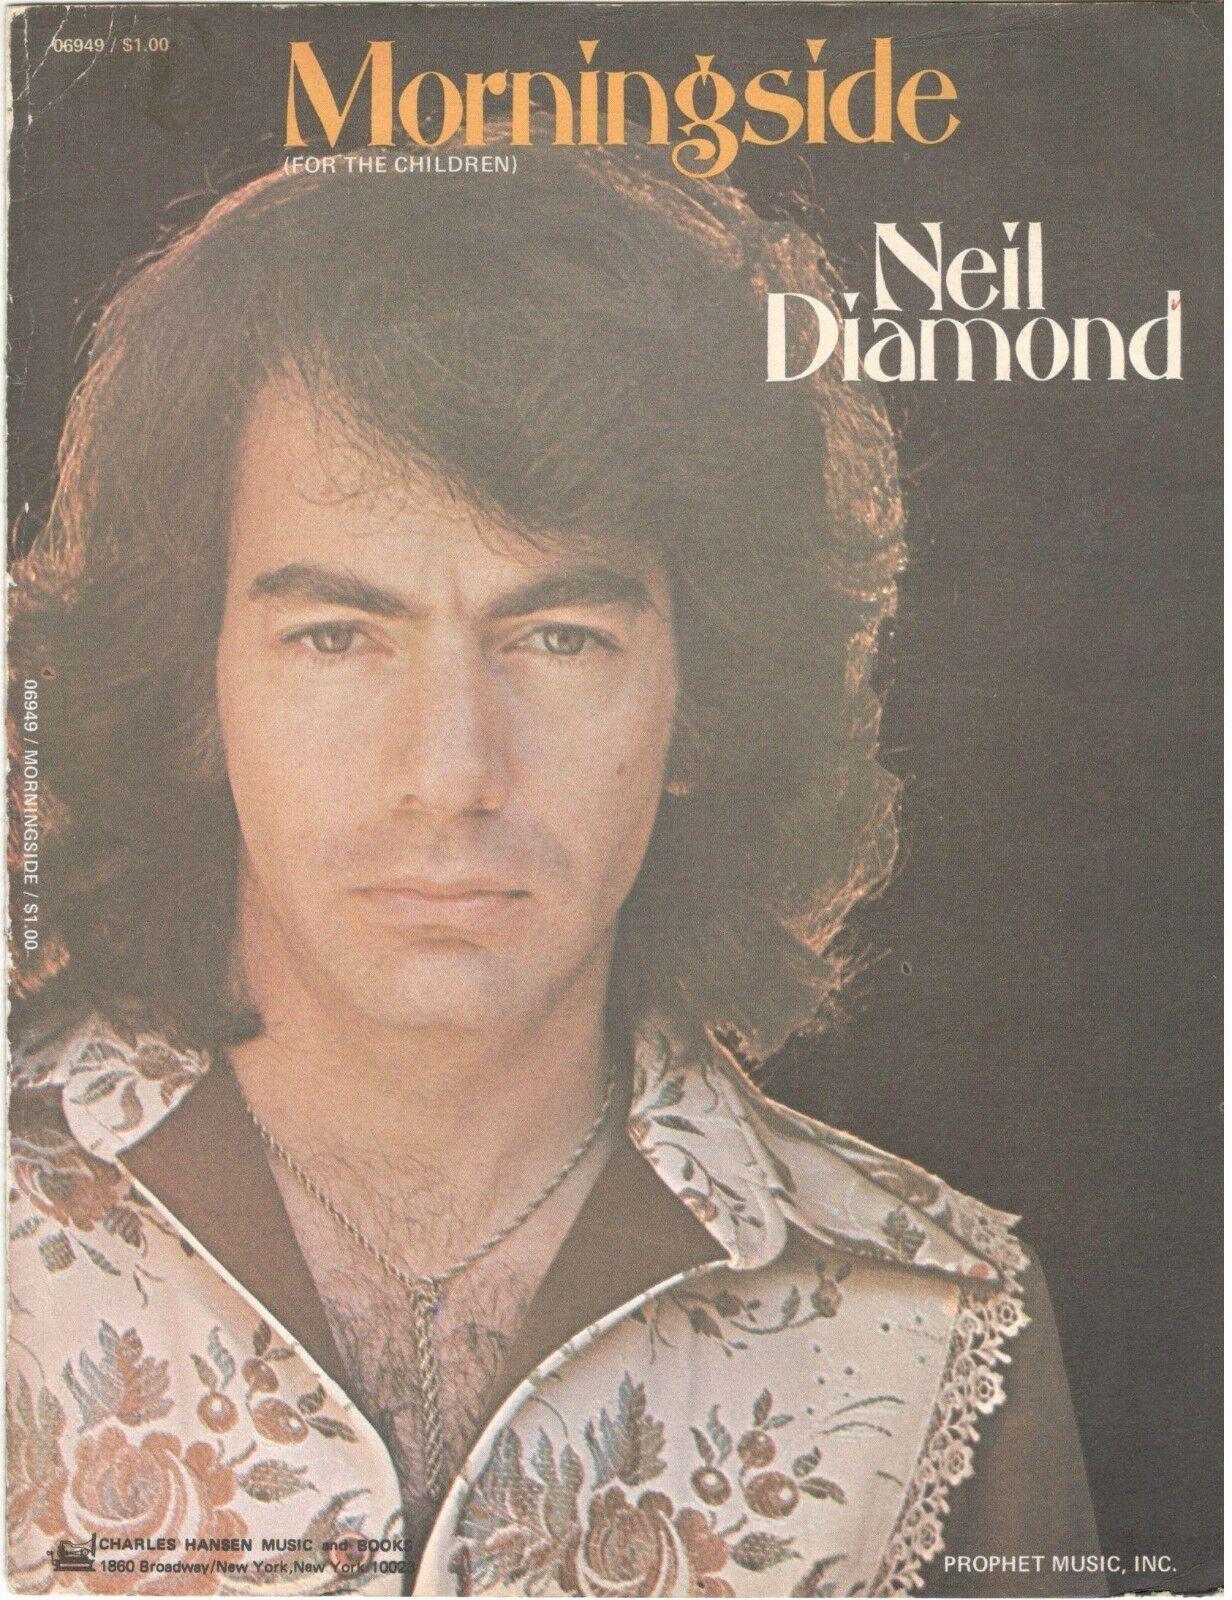 NEIL DIAMOND  MORNINGSIDE  SHEET MUSIC-PIANO VOCAL GUITAR CHORDS-1972-RARE-NEW